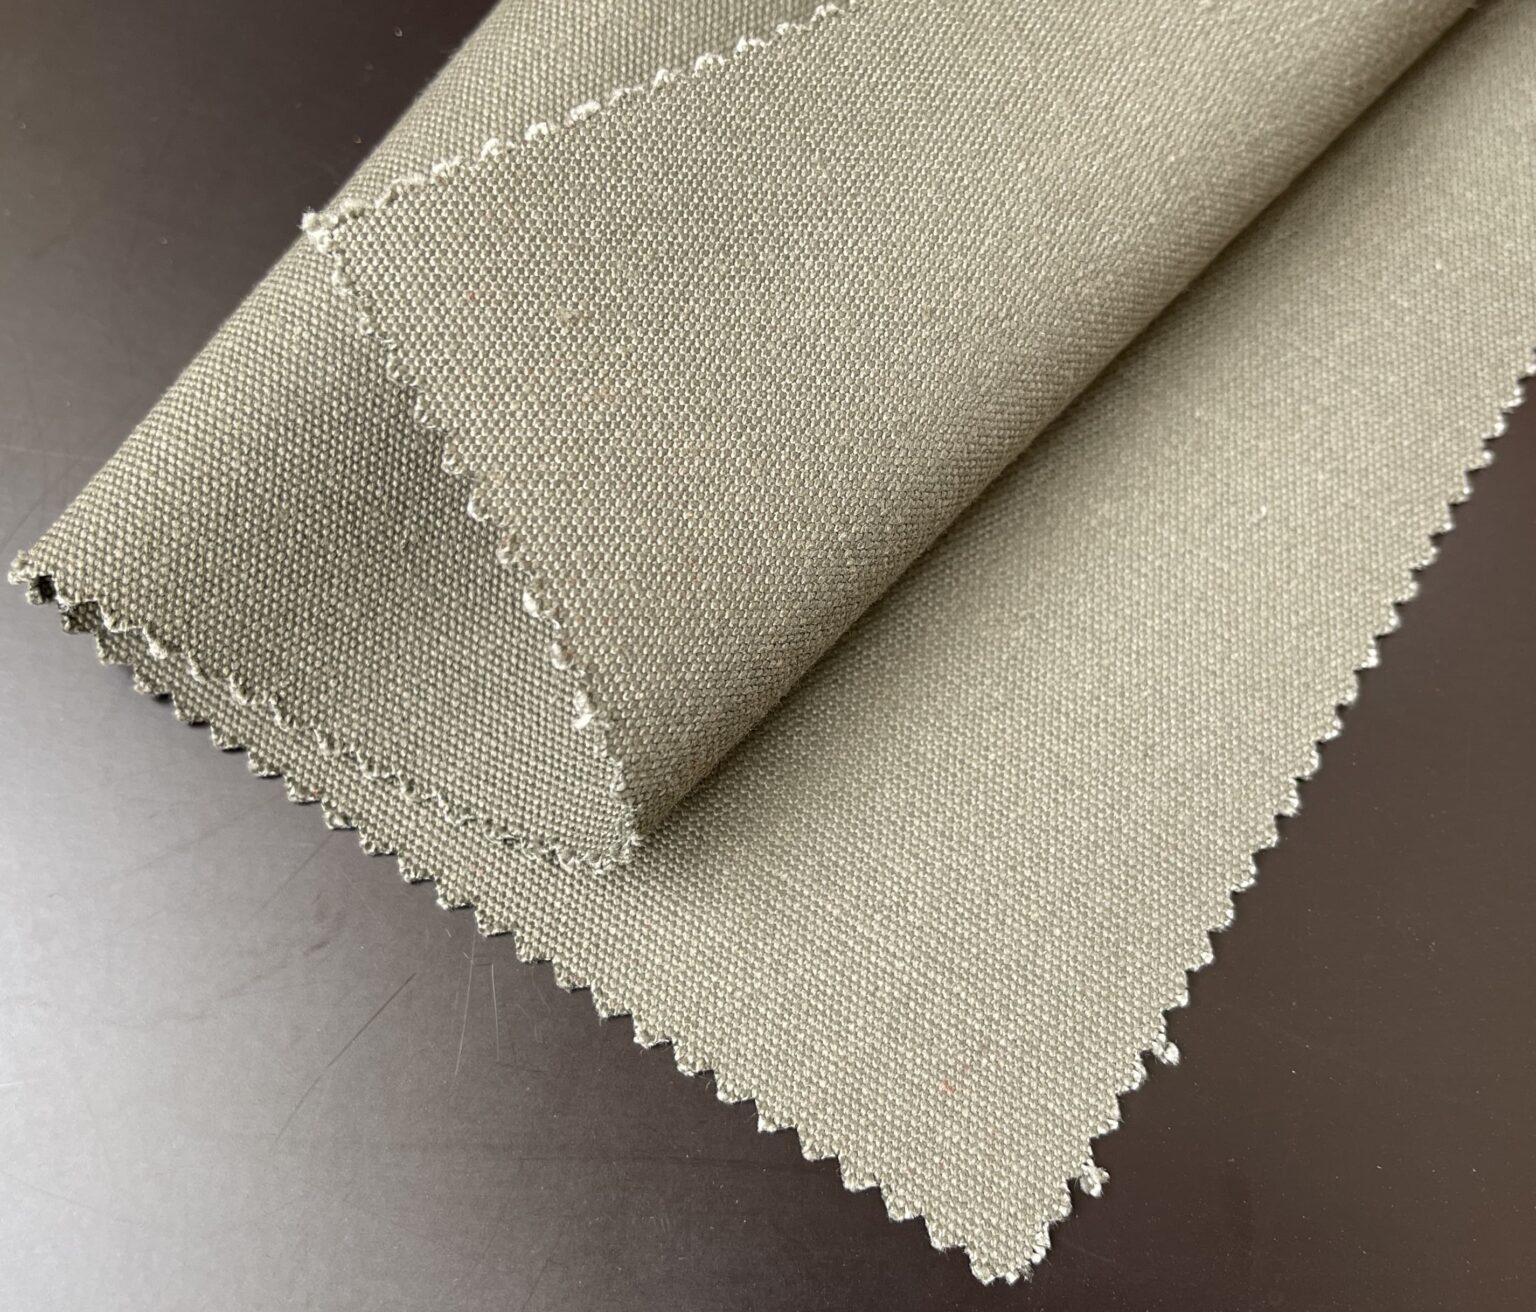 Awning Fabrics